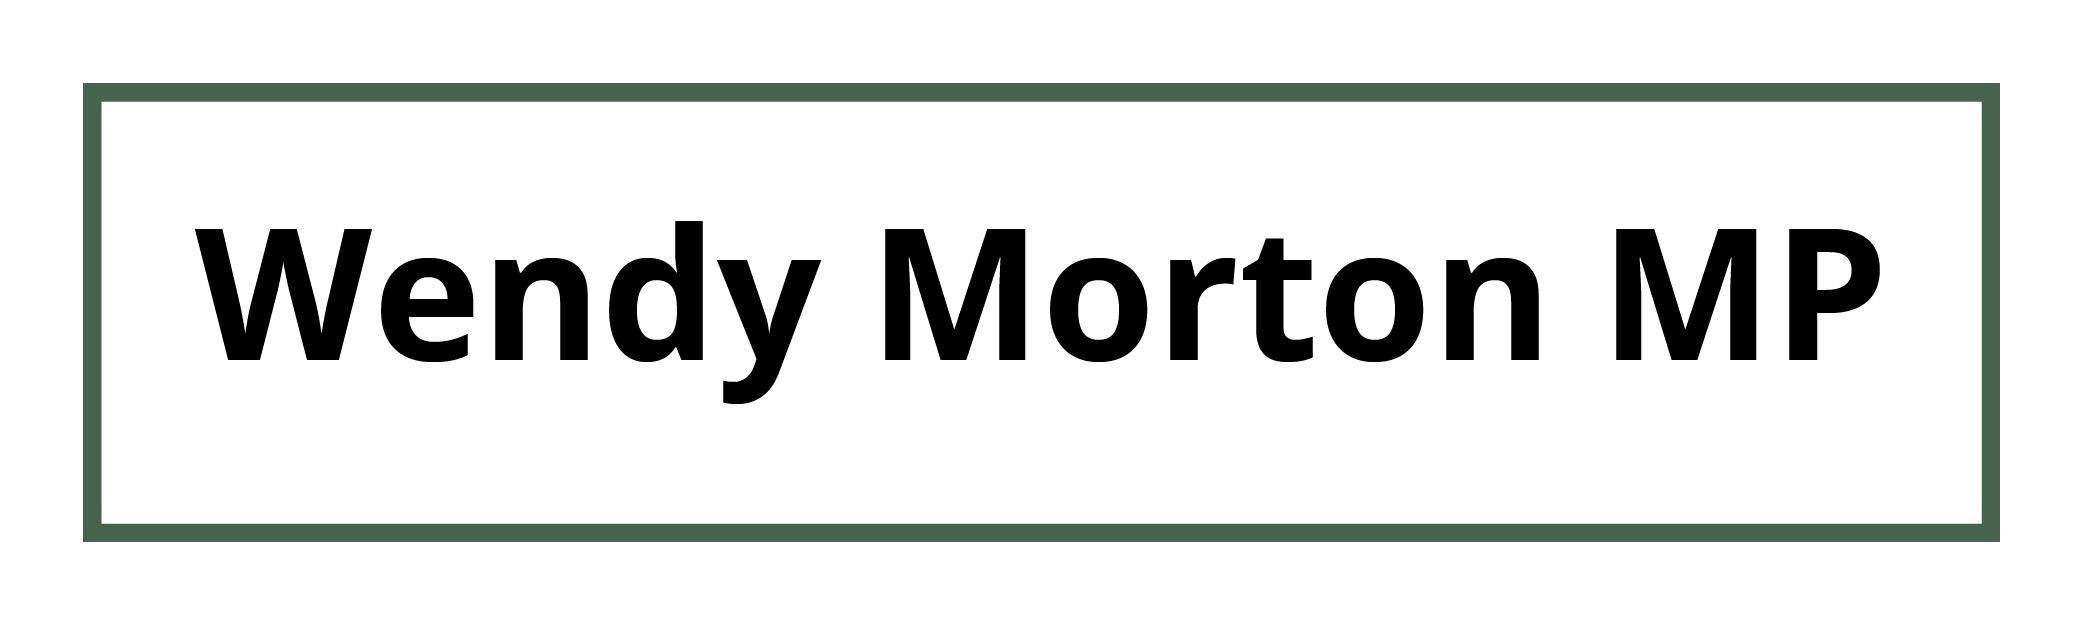 Wendy Morton